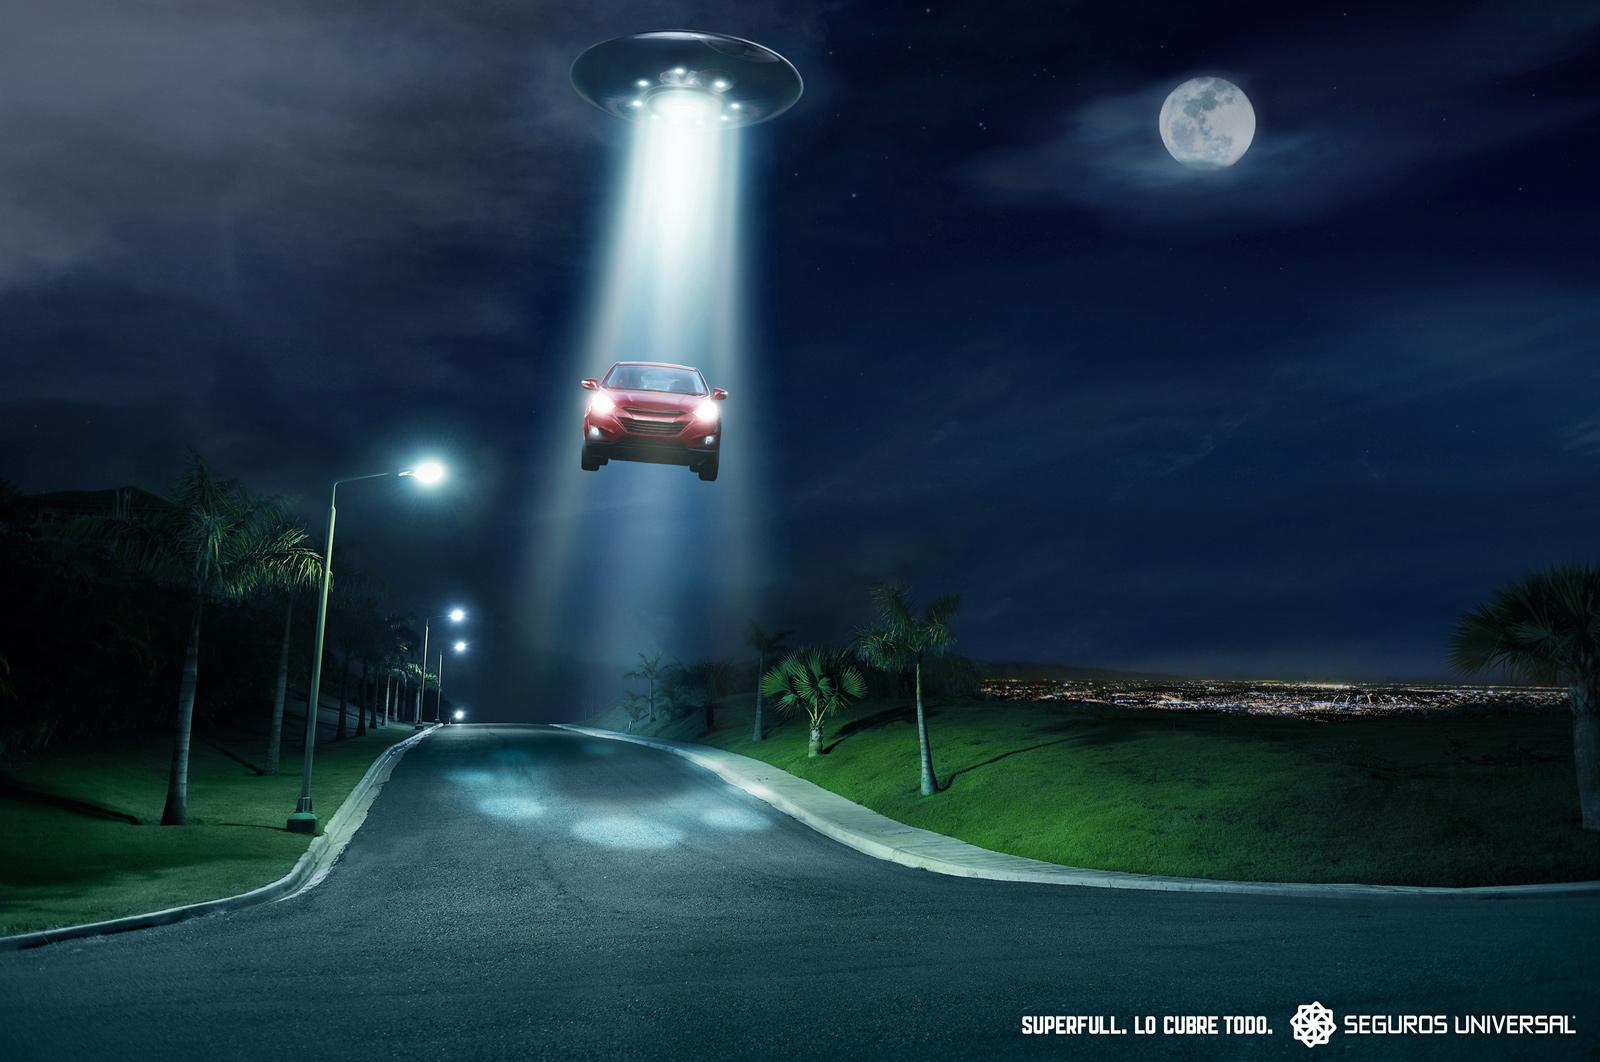 Universal Seguros Print Ad -  UFO